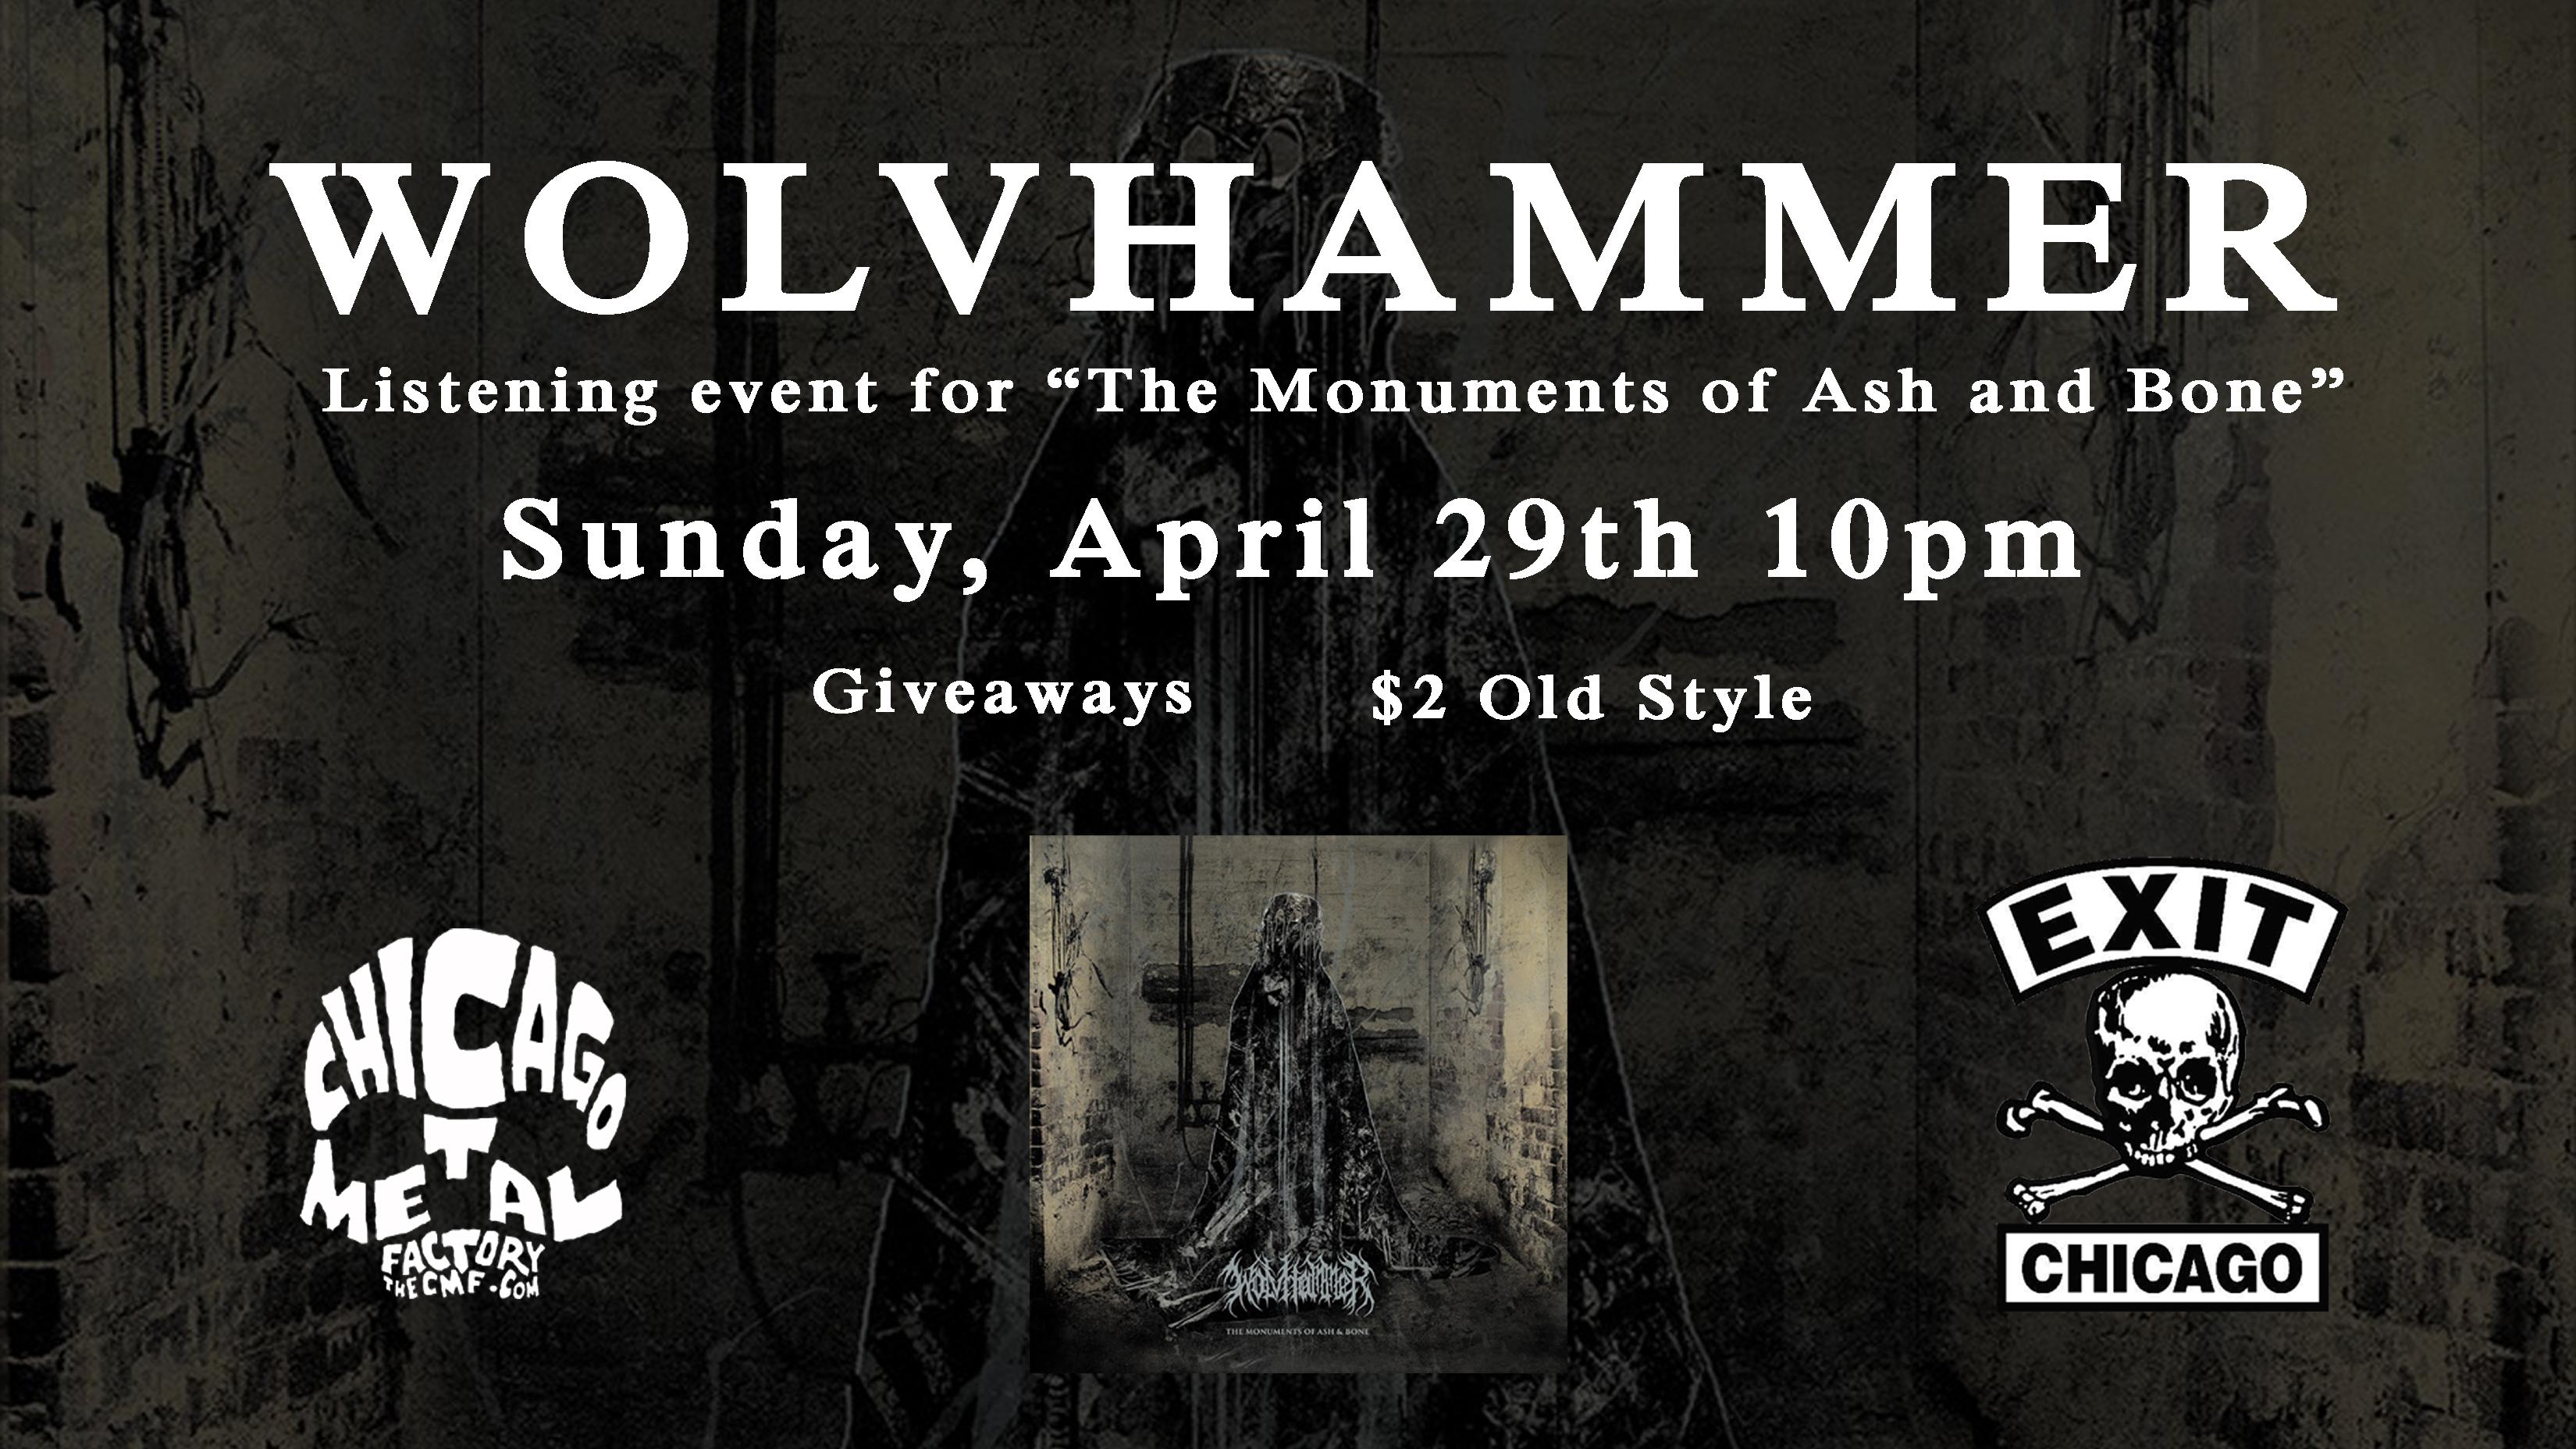 wolvhammer-event